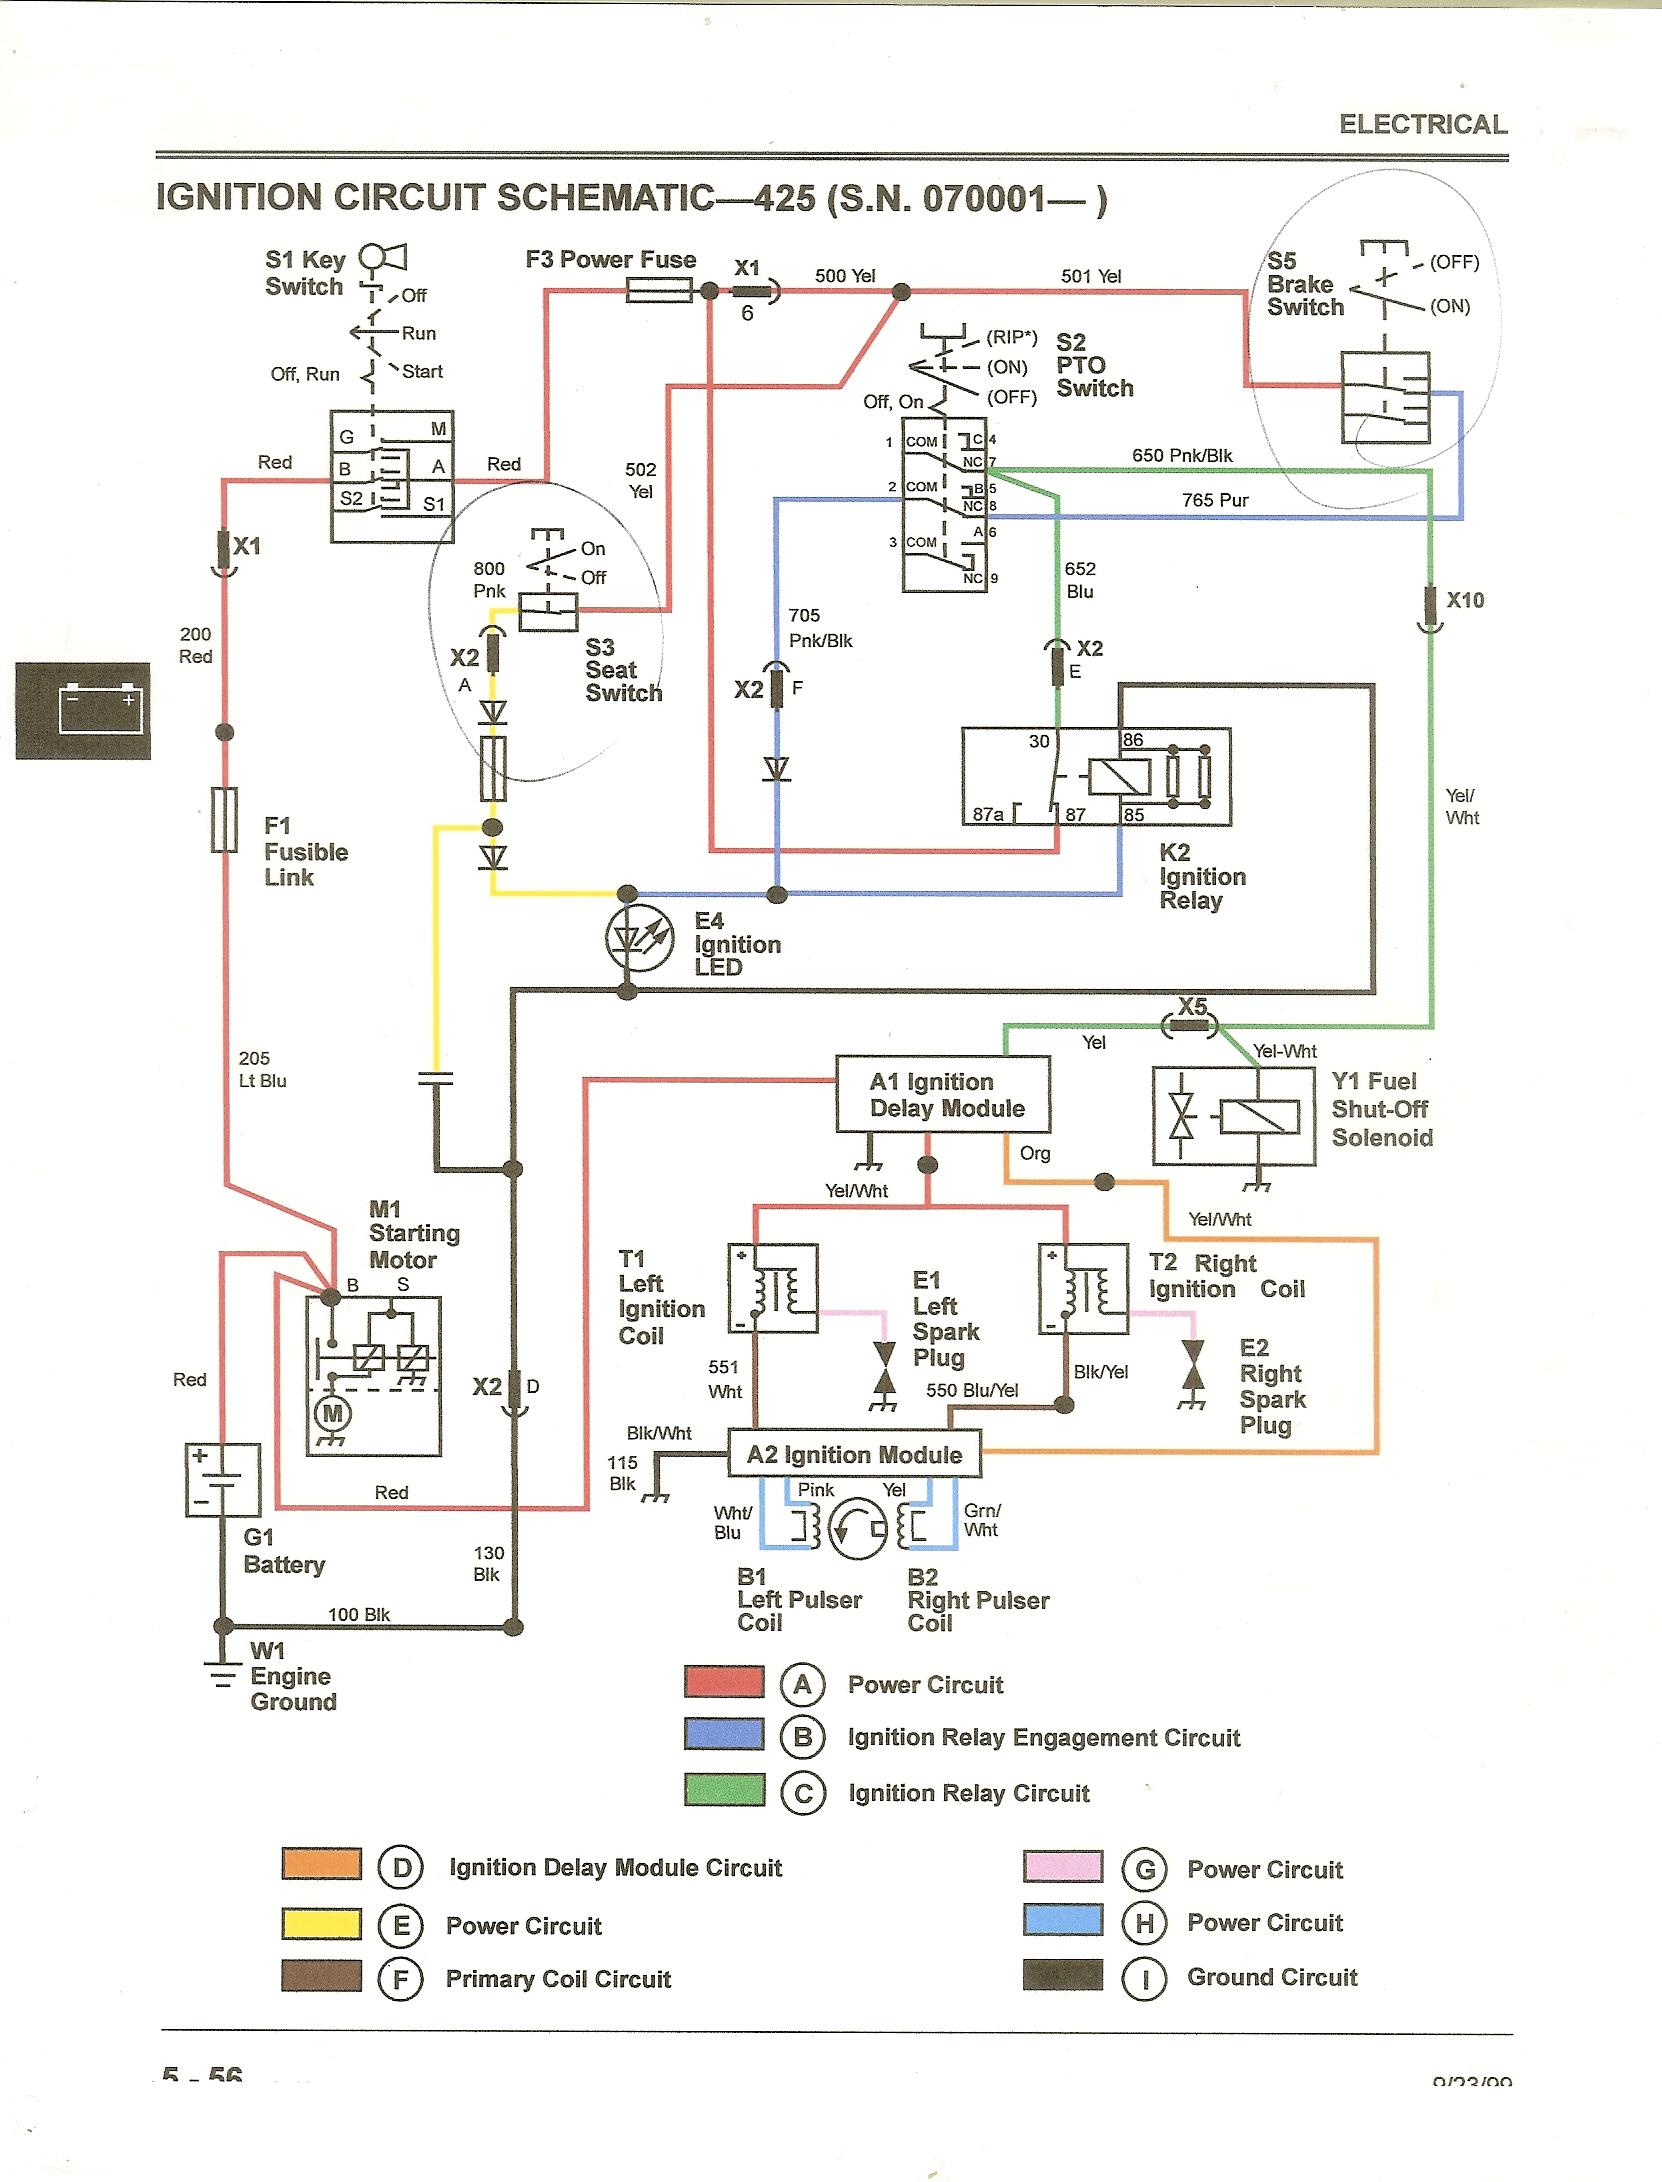 DIAGRAM] Jd 425 Wiring Diagram FULL Version HD Quality Wiring Diagram -  QDIAGRAM.ANNA-MAILLARD.FRDiagram Database